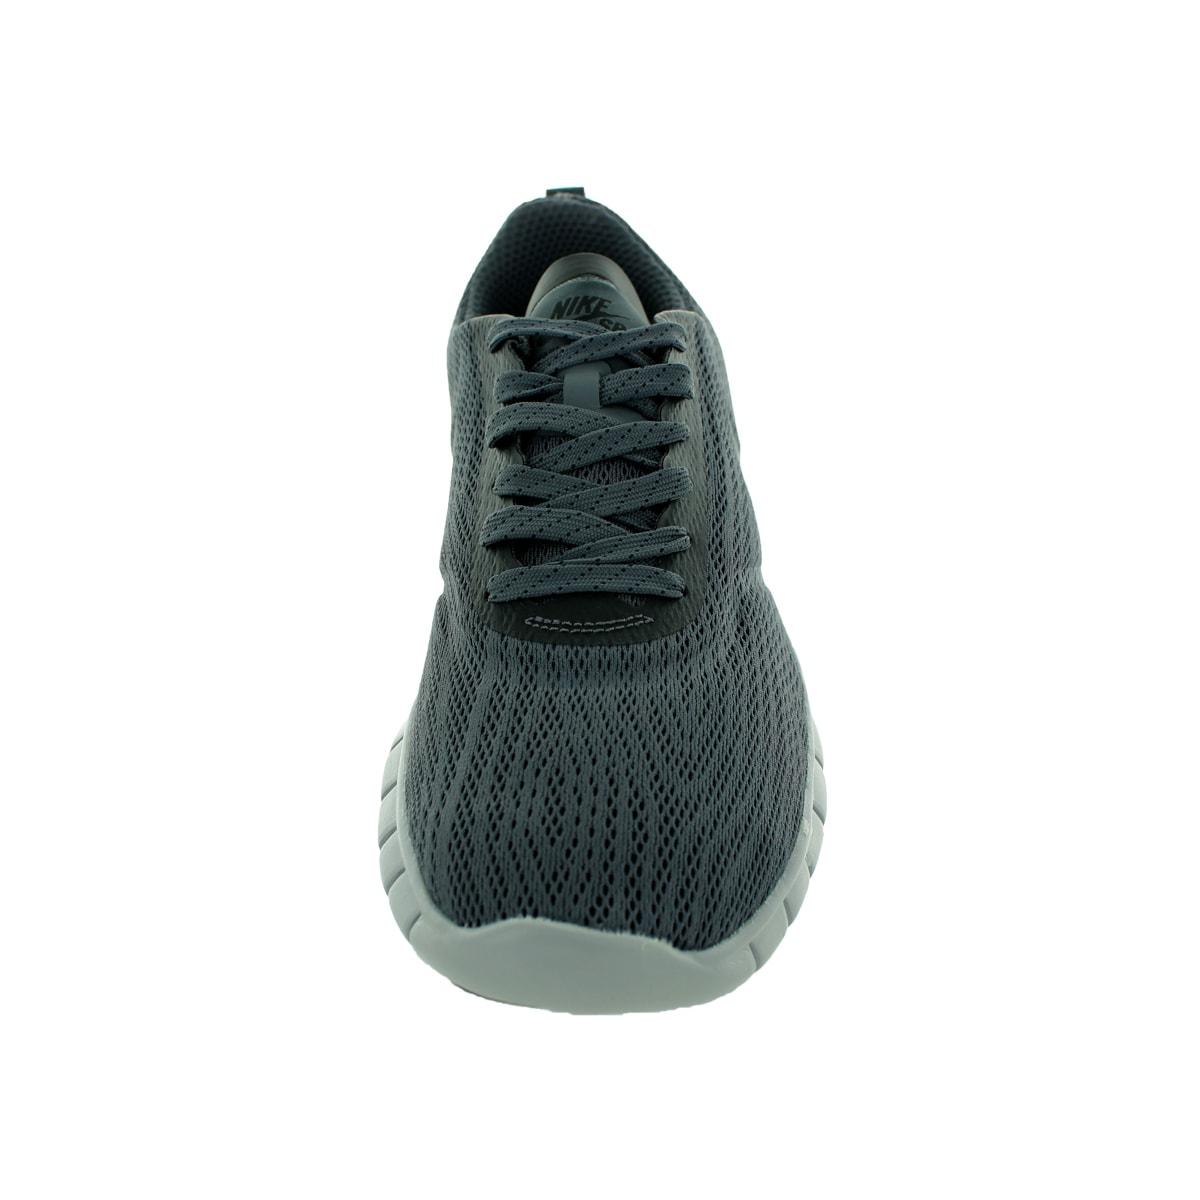 promo code 956d1 f1959 Shop Nike Mens Paul Rodriguez 9 RR Dark GreyBlackWolf Grey Skate Shoe -  Free Shipping Today - Overstock.com - 12118907